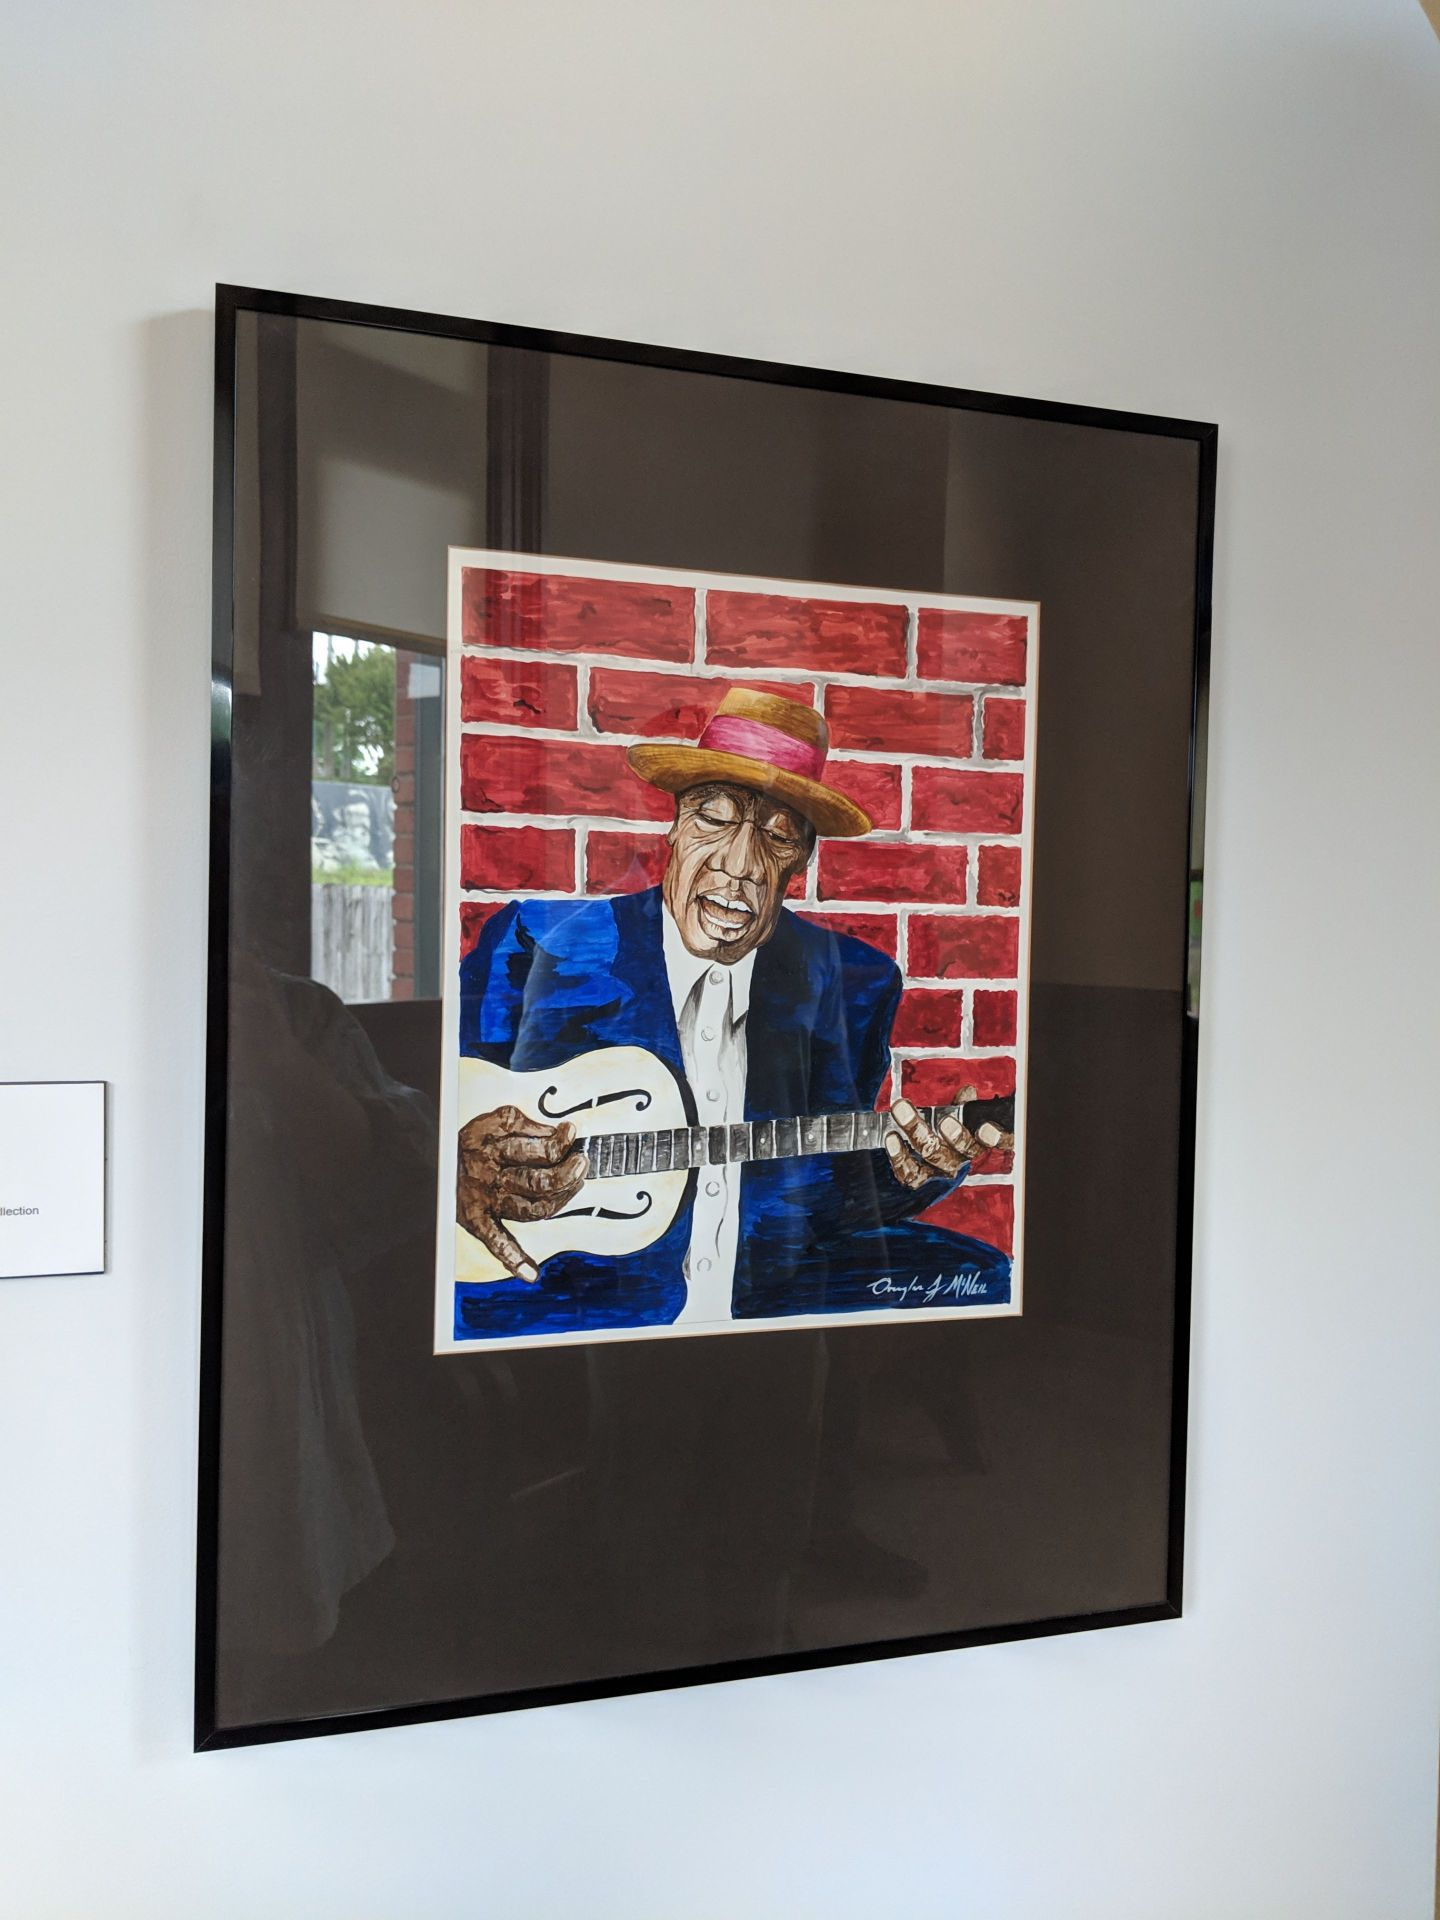 IMG_20190503_114125-1440x1920 Arkansas Delta Family Road Trip:  Black Heritage, Art & More!